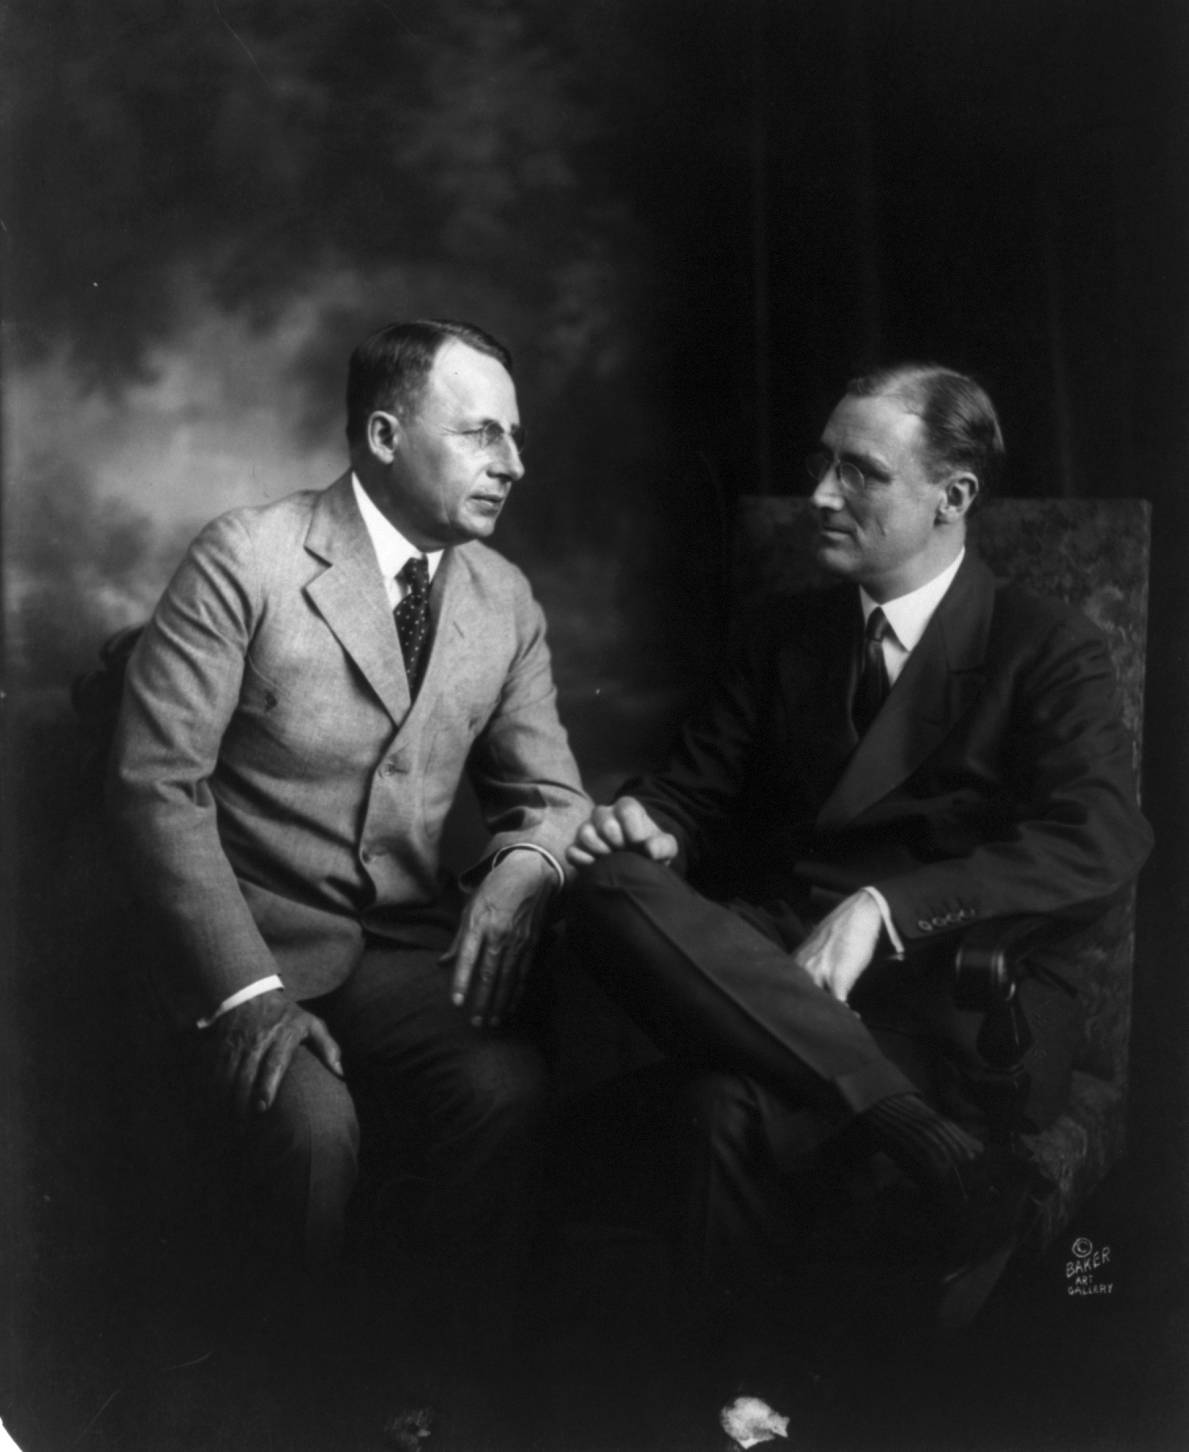 franklin d roosevelt and herbert c Herbert hoover franklin d roosevelt franklin delano roosevelt served as president from march 1933 to april 1945  franklin d roosevelt essays.